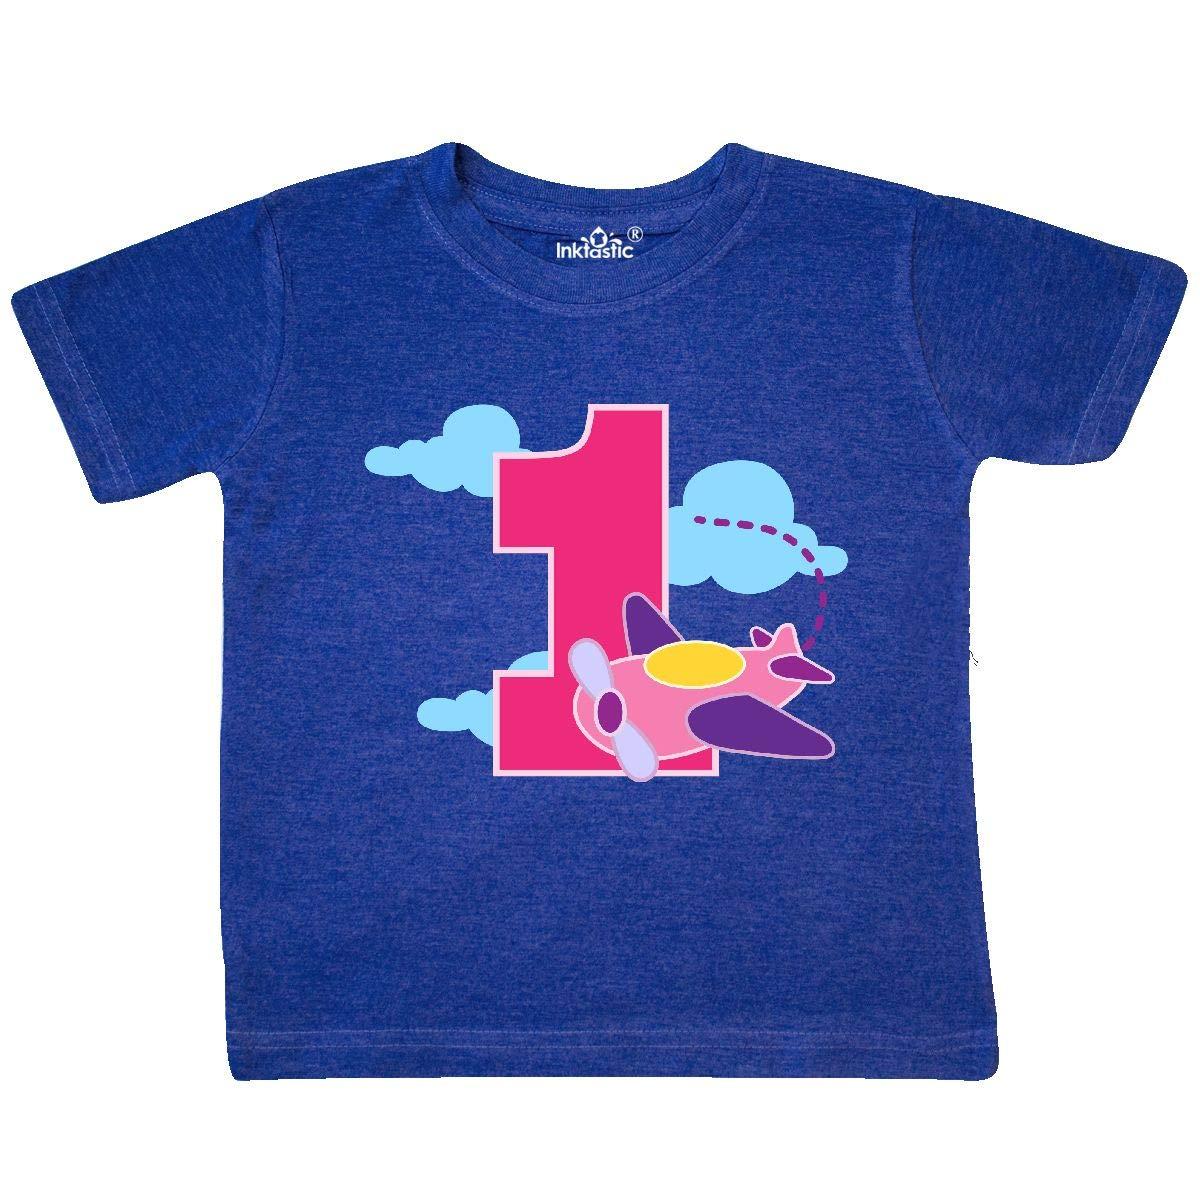 inktastic 1st Birthday Pilot Airplane Toddler T-Shirt